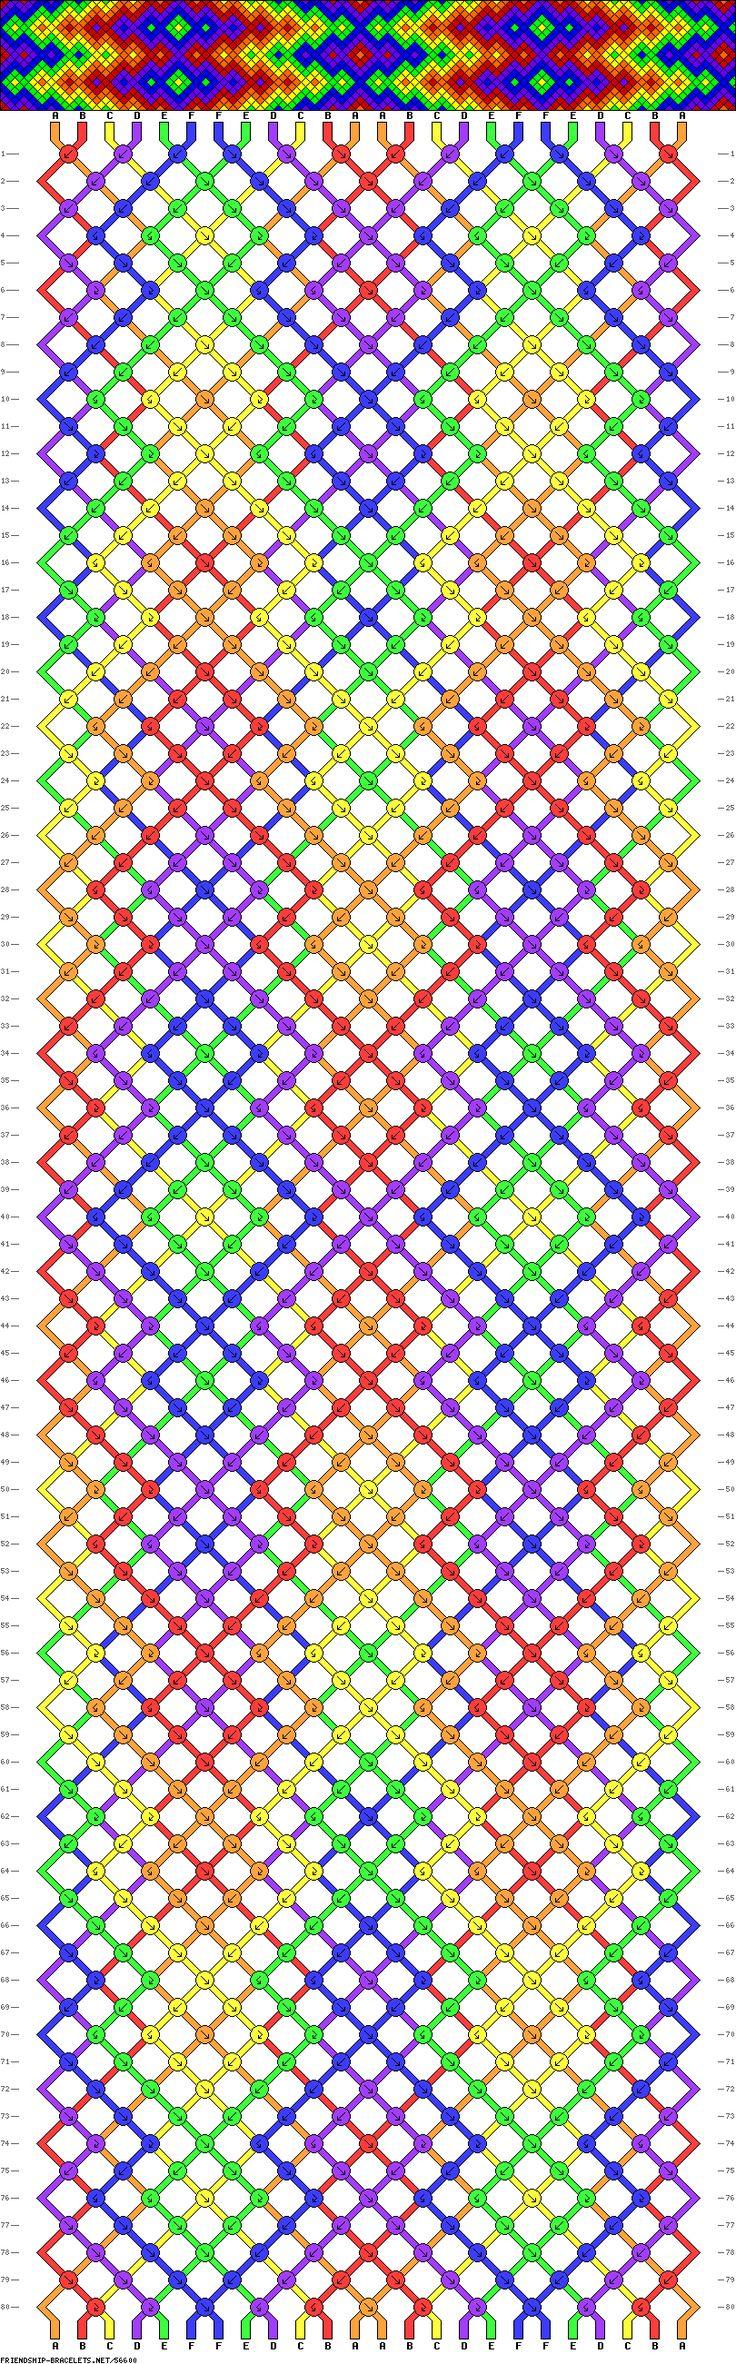 Friendship bracelet pattern - diamonds, chevron, burst, rainbow - 24 strings - 6 colors